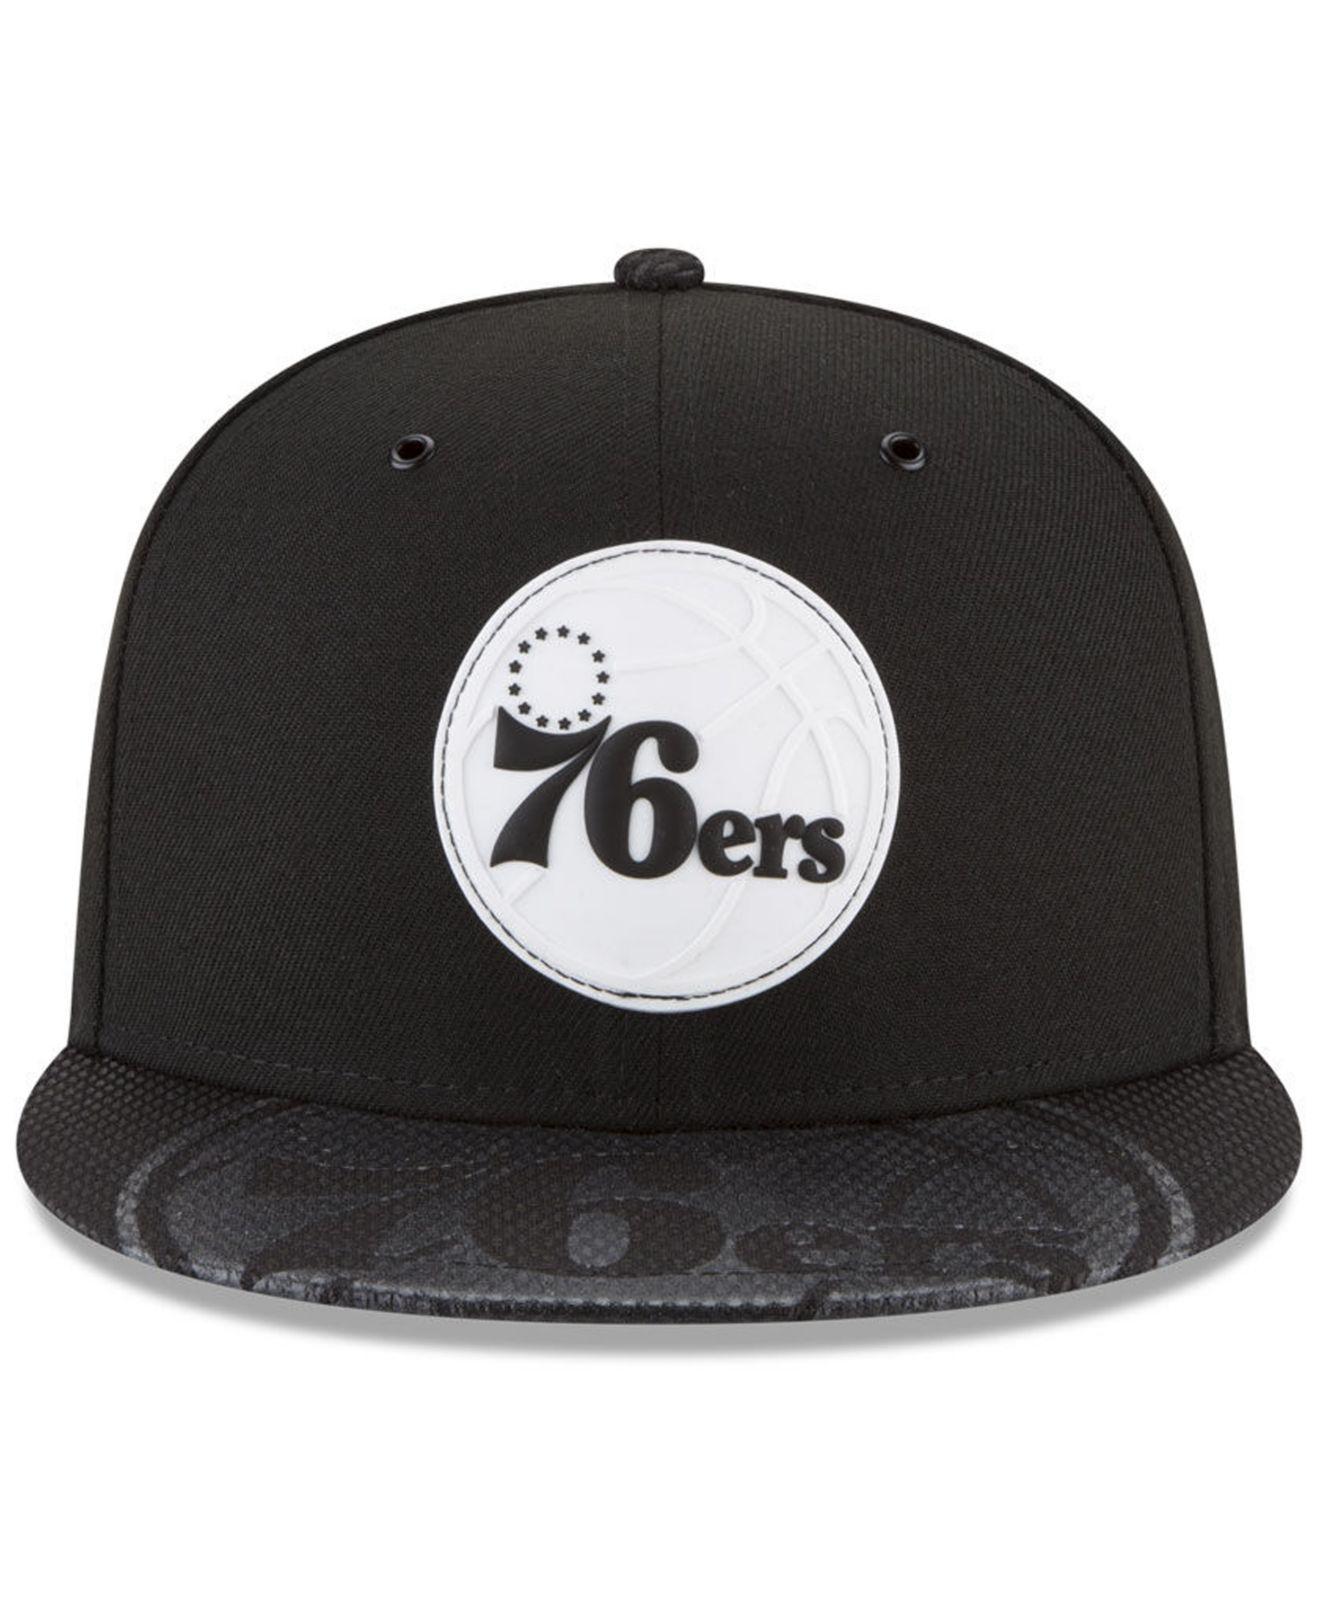 the latest 40460 9d220 ... canada lyst ktz philadelphia 76ers back 1 2 series 9fifty snapback cap  in black for men